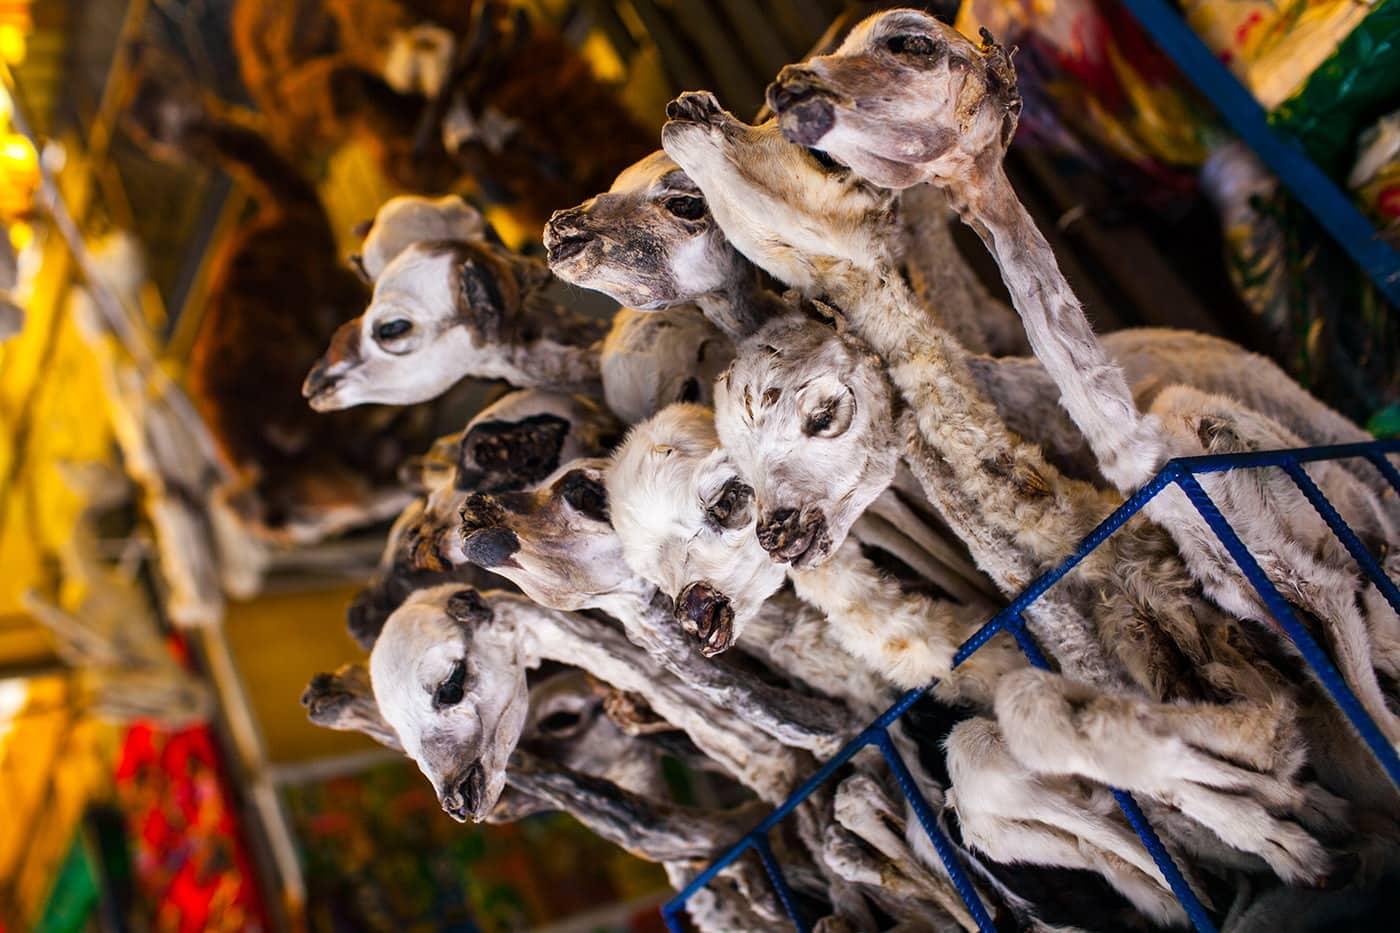 Llama fetus at the Witches' Market in La Paz, Bolivia